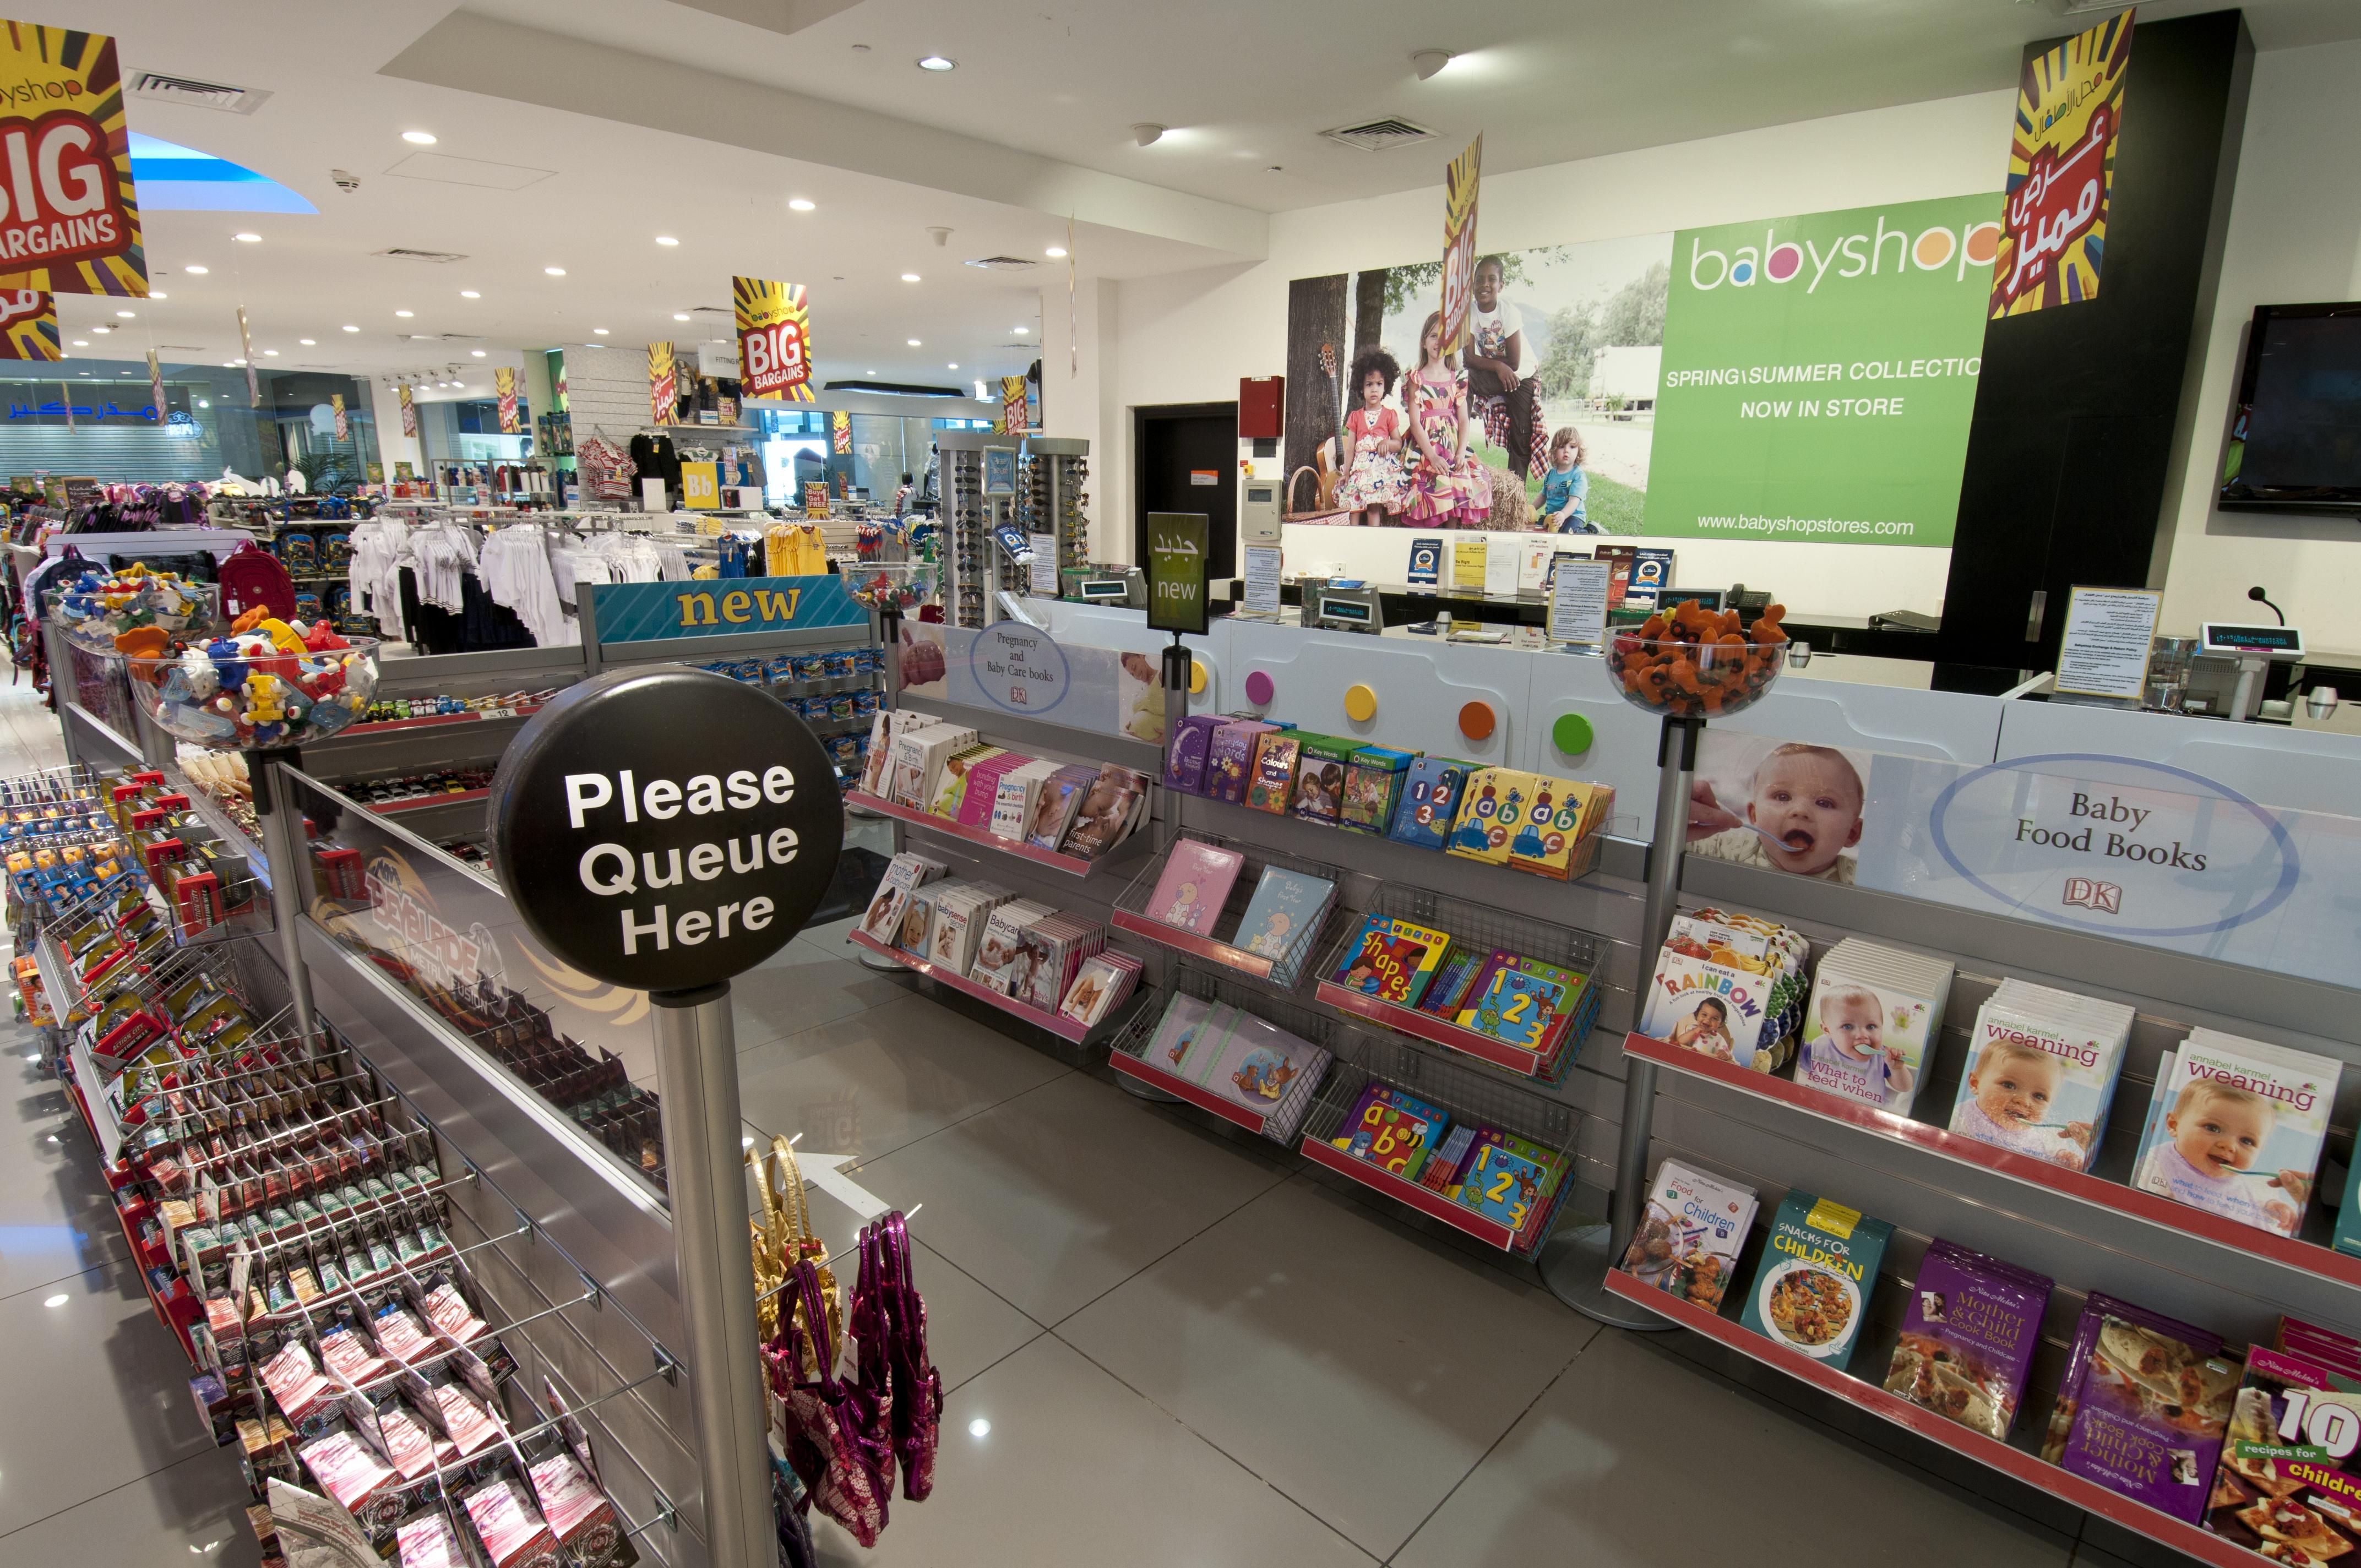 Tensator In-queue merchandising installed in Babyshop Dubai to increase impulse purchases